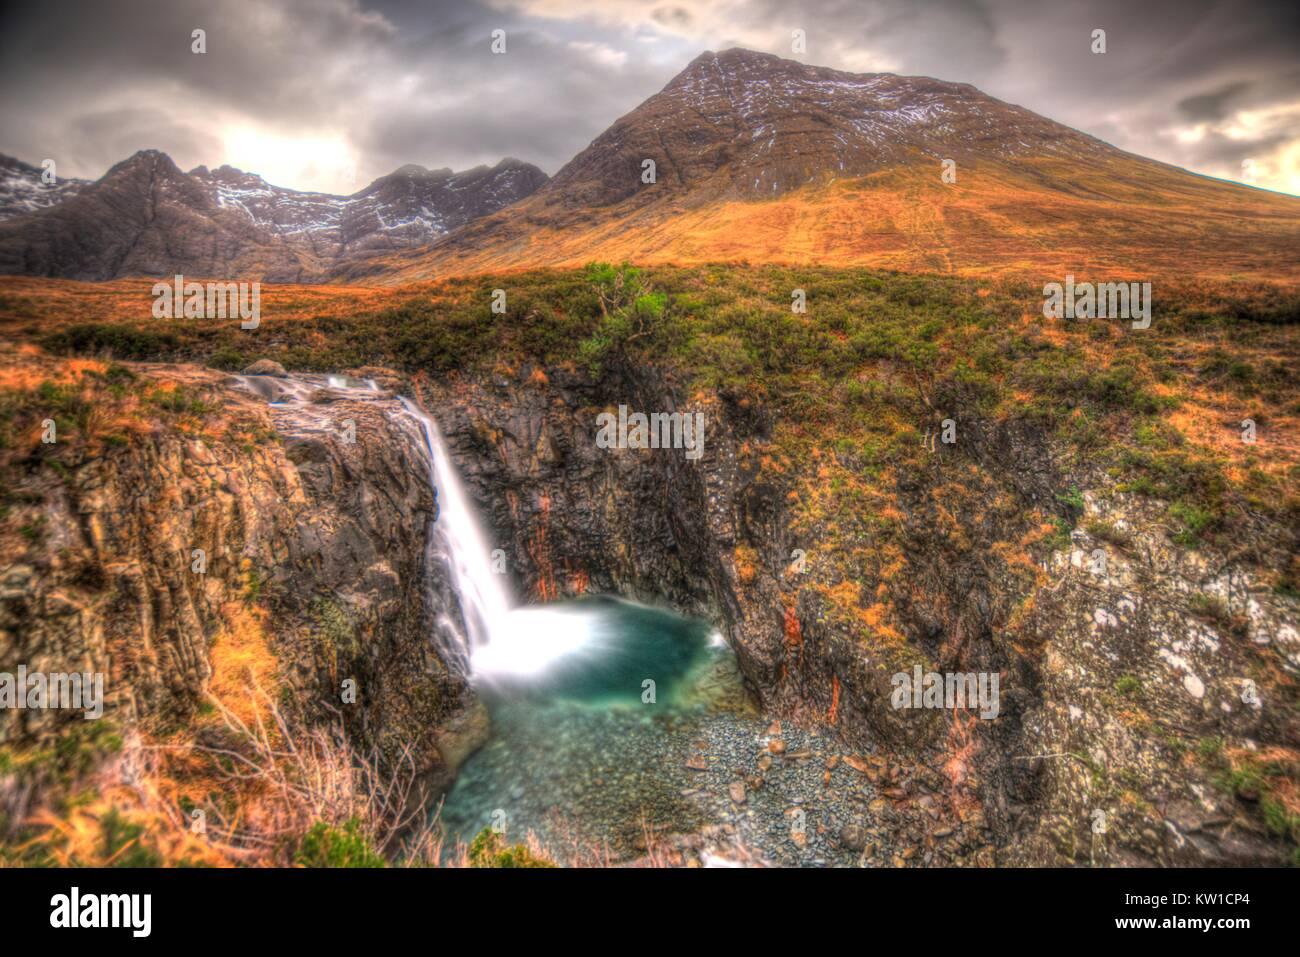 Fairy Pools on Isle of Skye - Stock Image